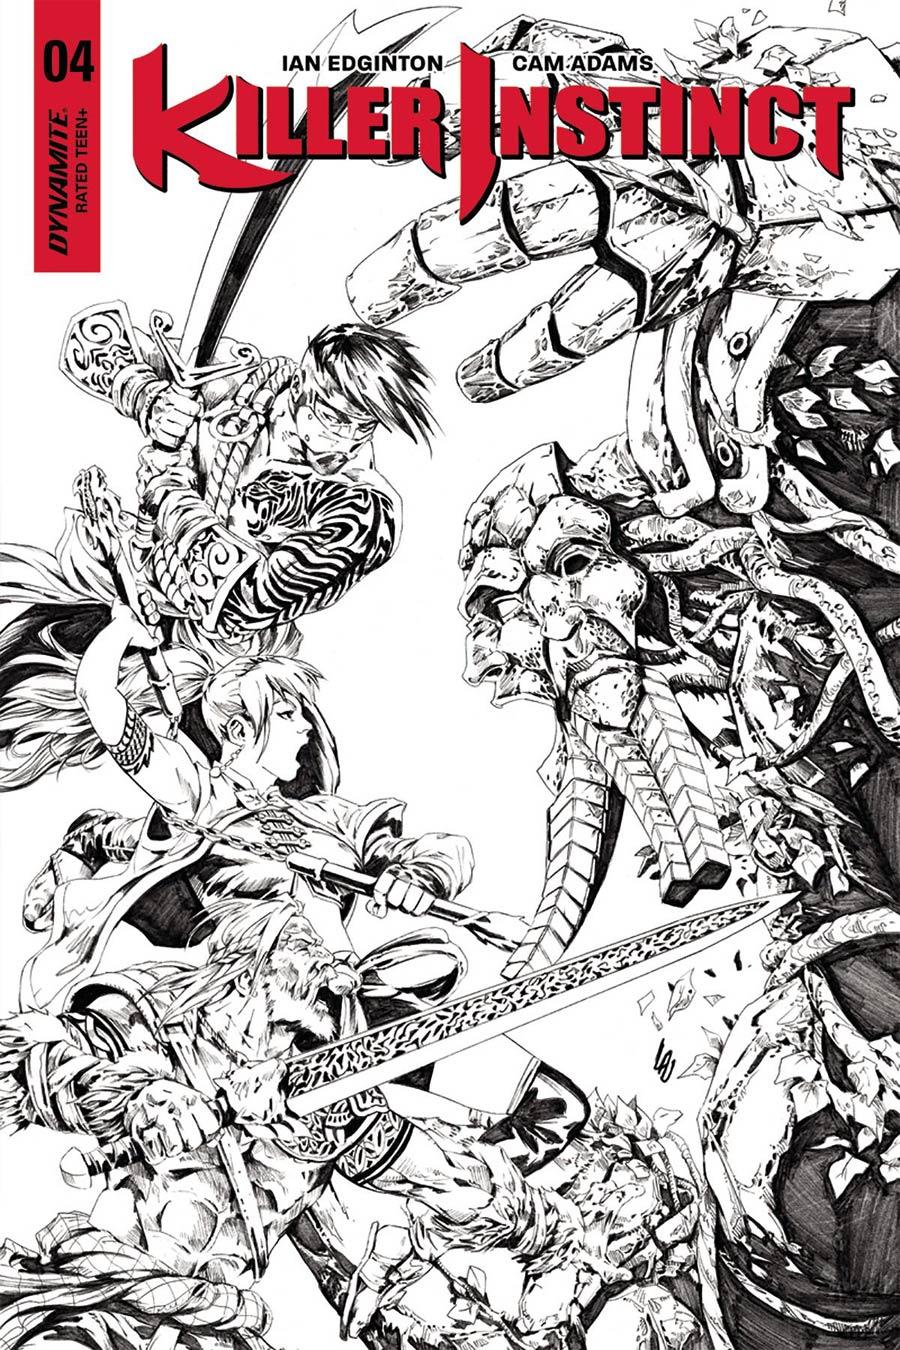 Killer Instinct Vol 2 #4 Cover D Incentive Jonathan Lau Black & White Cover